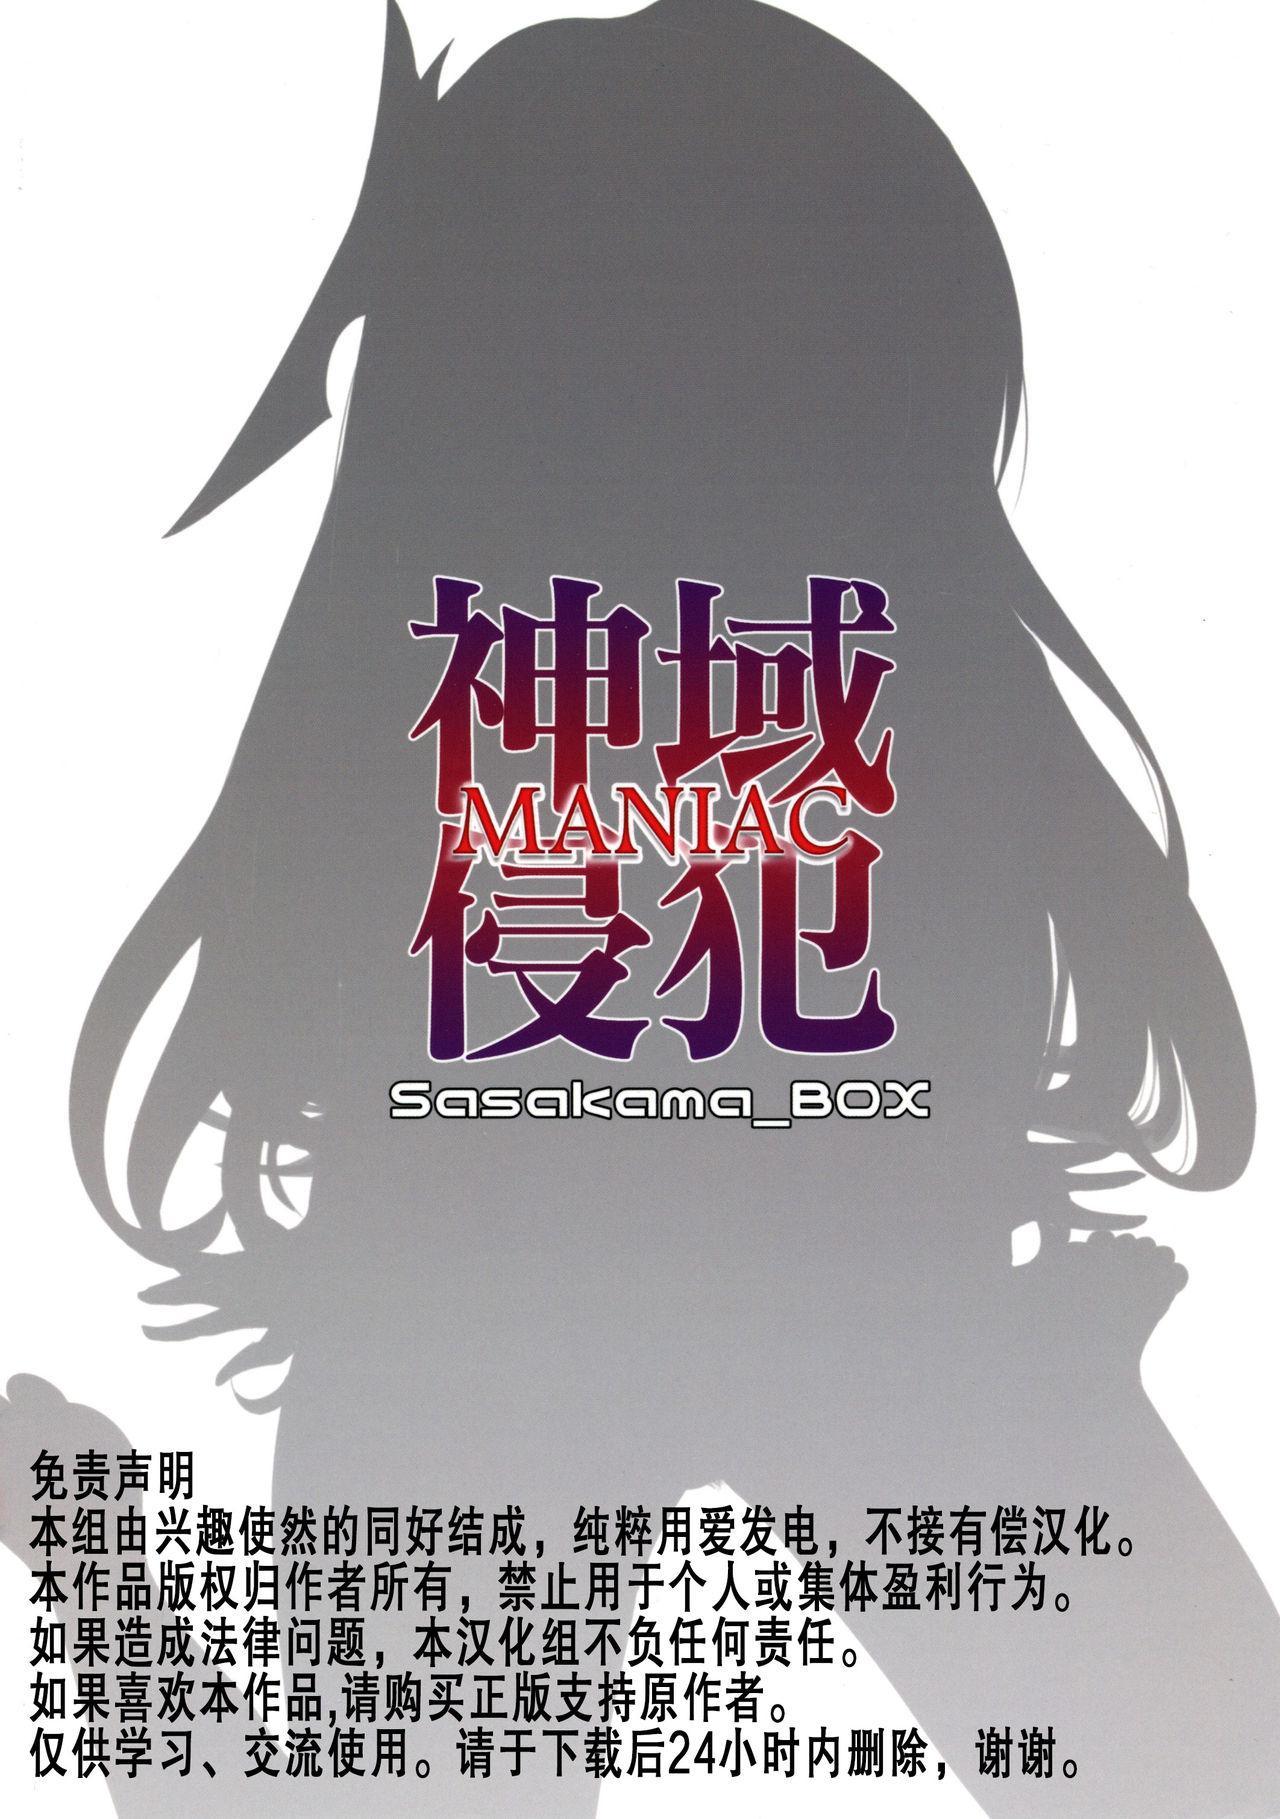 Shiniki Shinpan MANIAC   神域侵犯 MANIAC 18